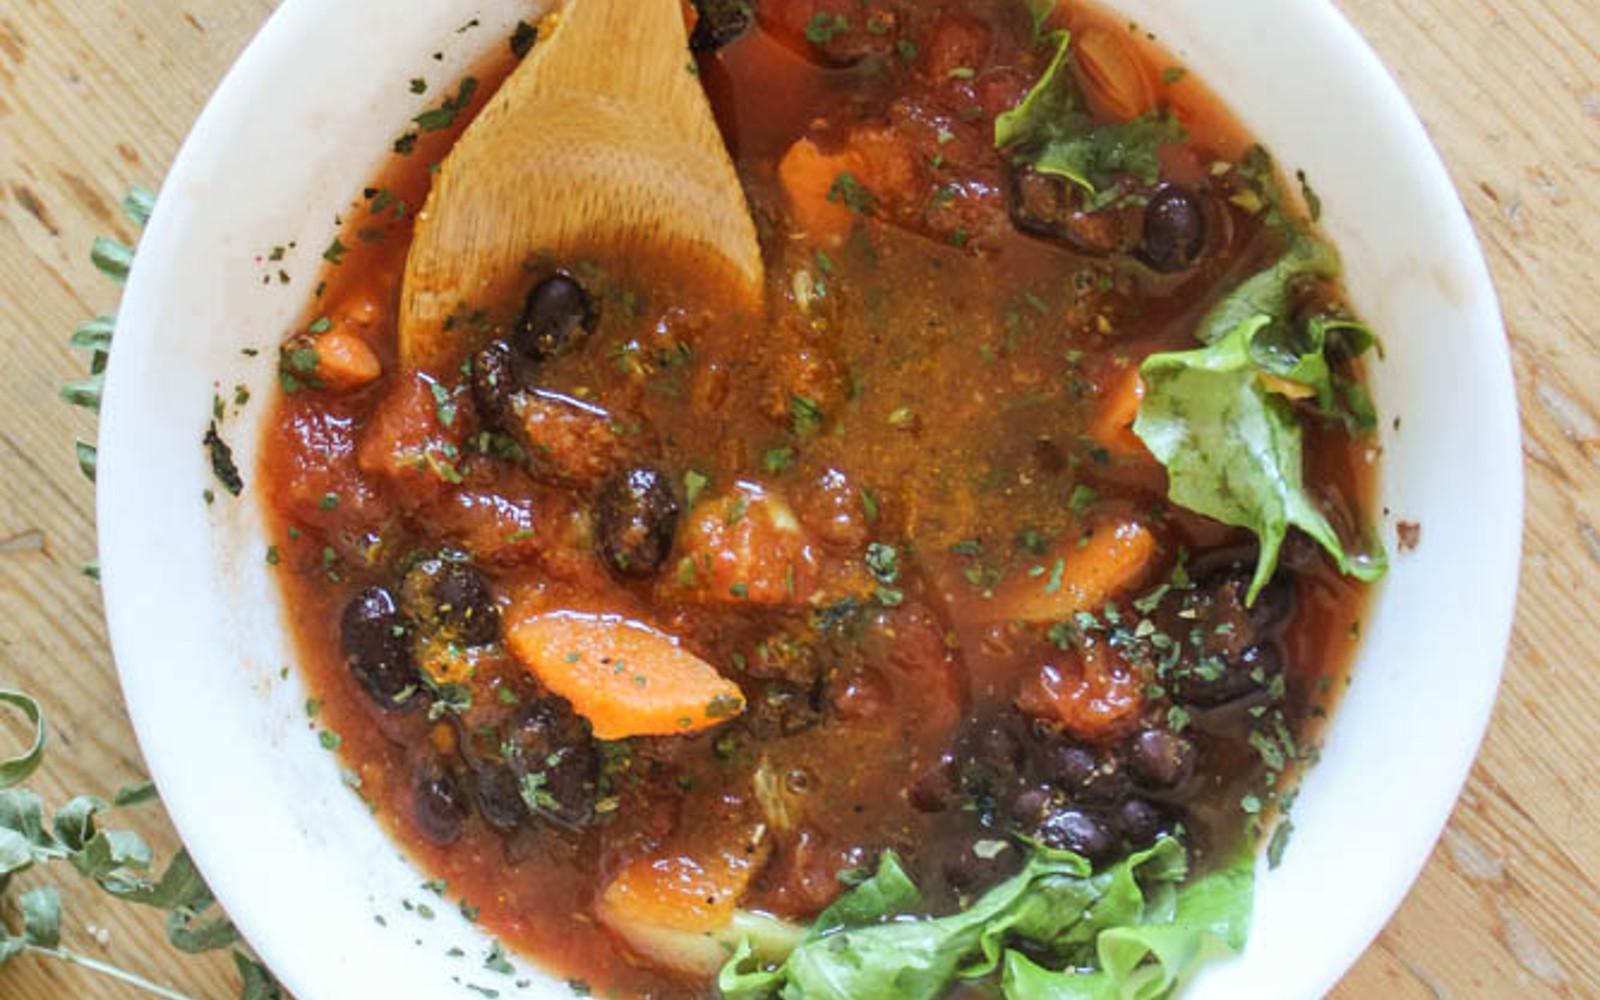 Vegan Grain-Free Soothing Sweet Potato and Beet Soup